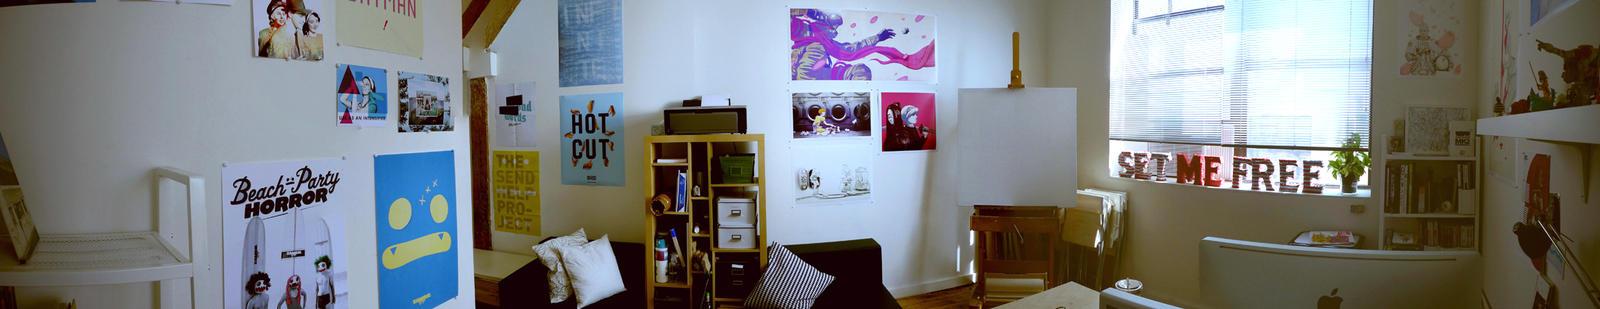 Open Studio Panorama 02